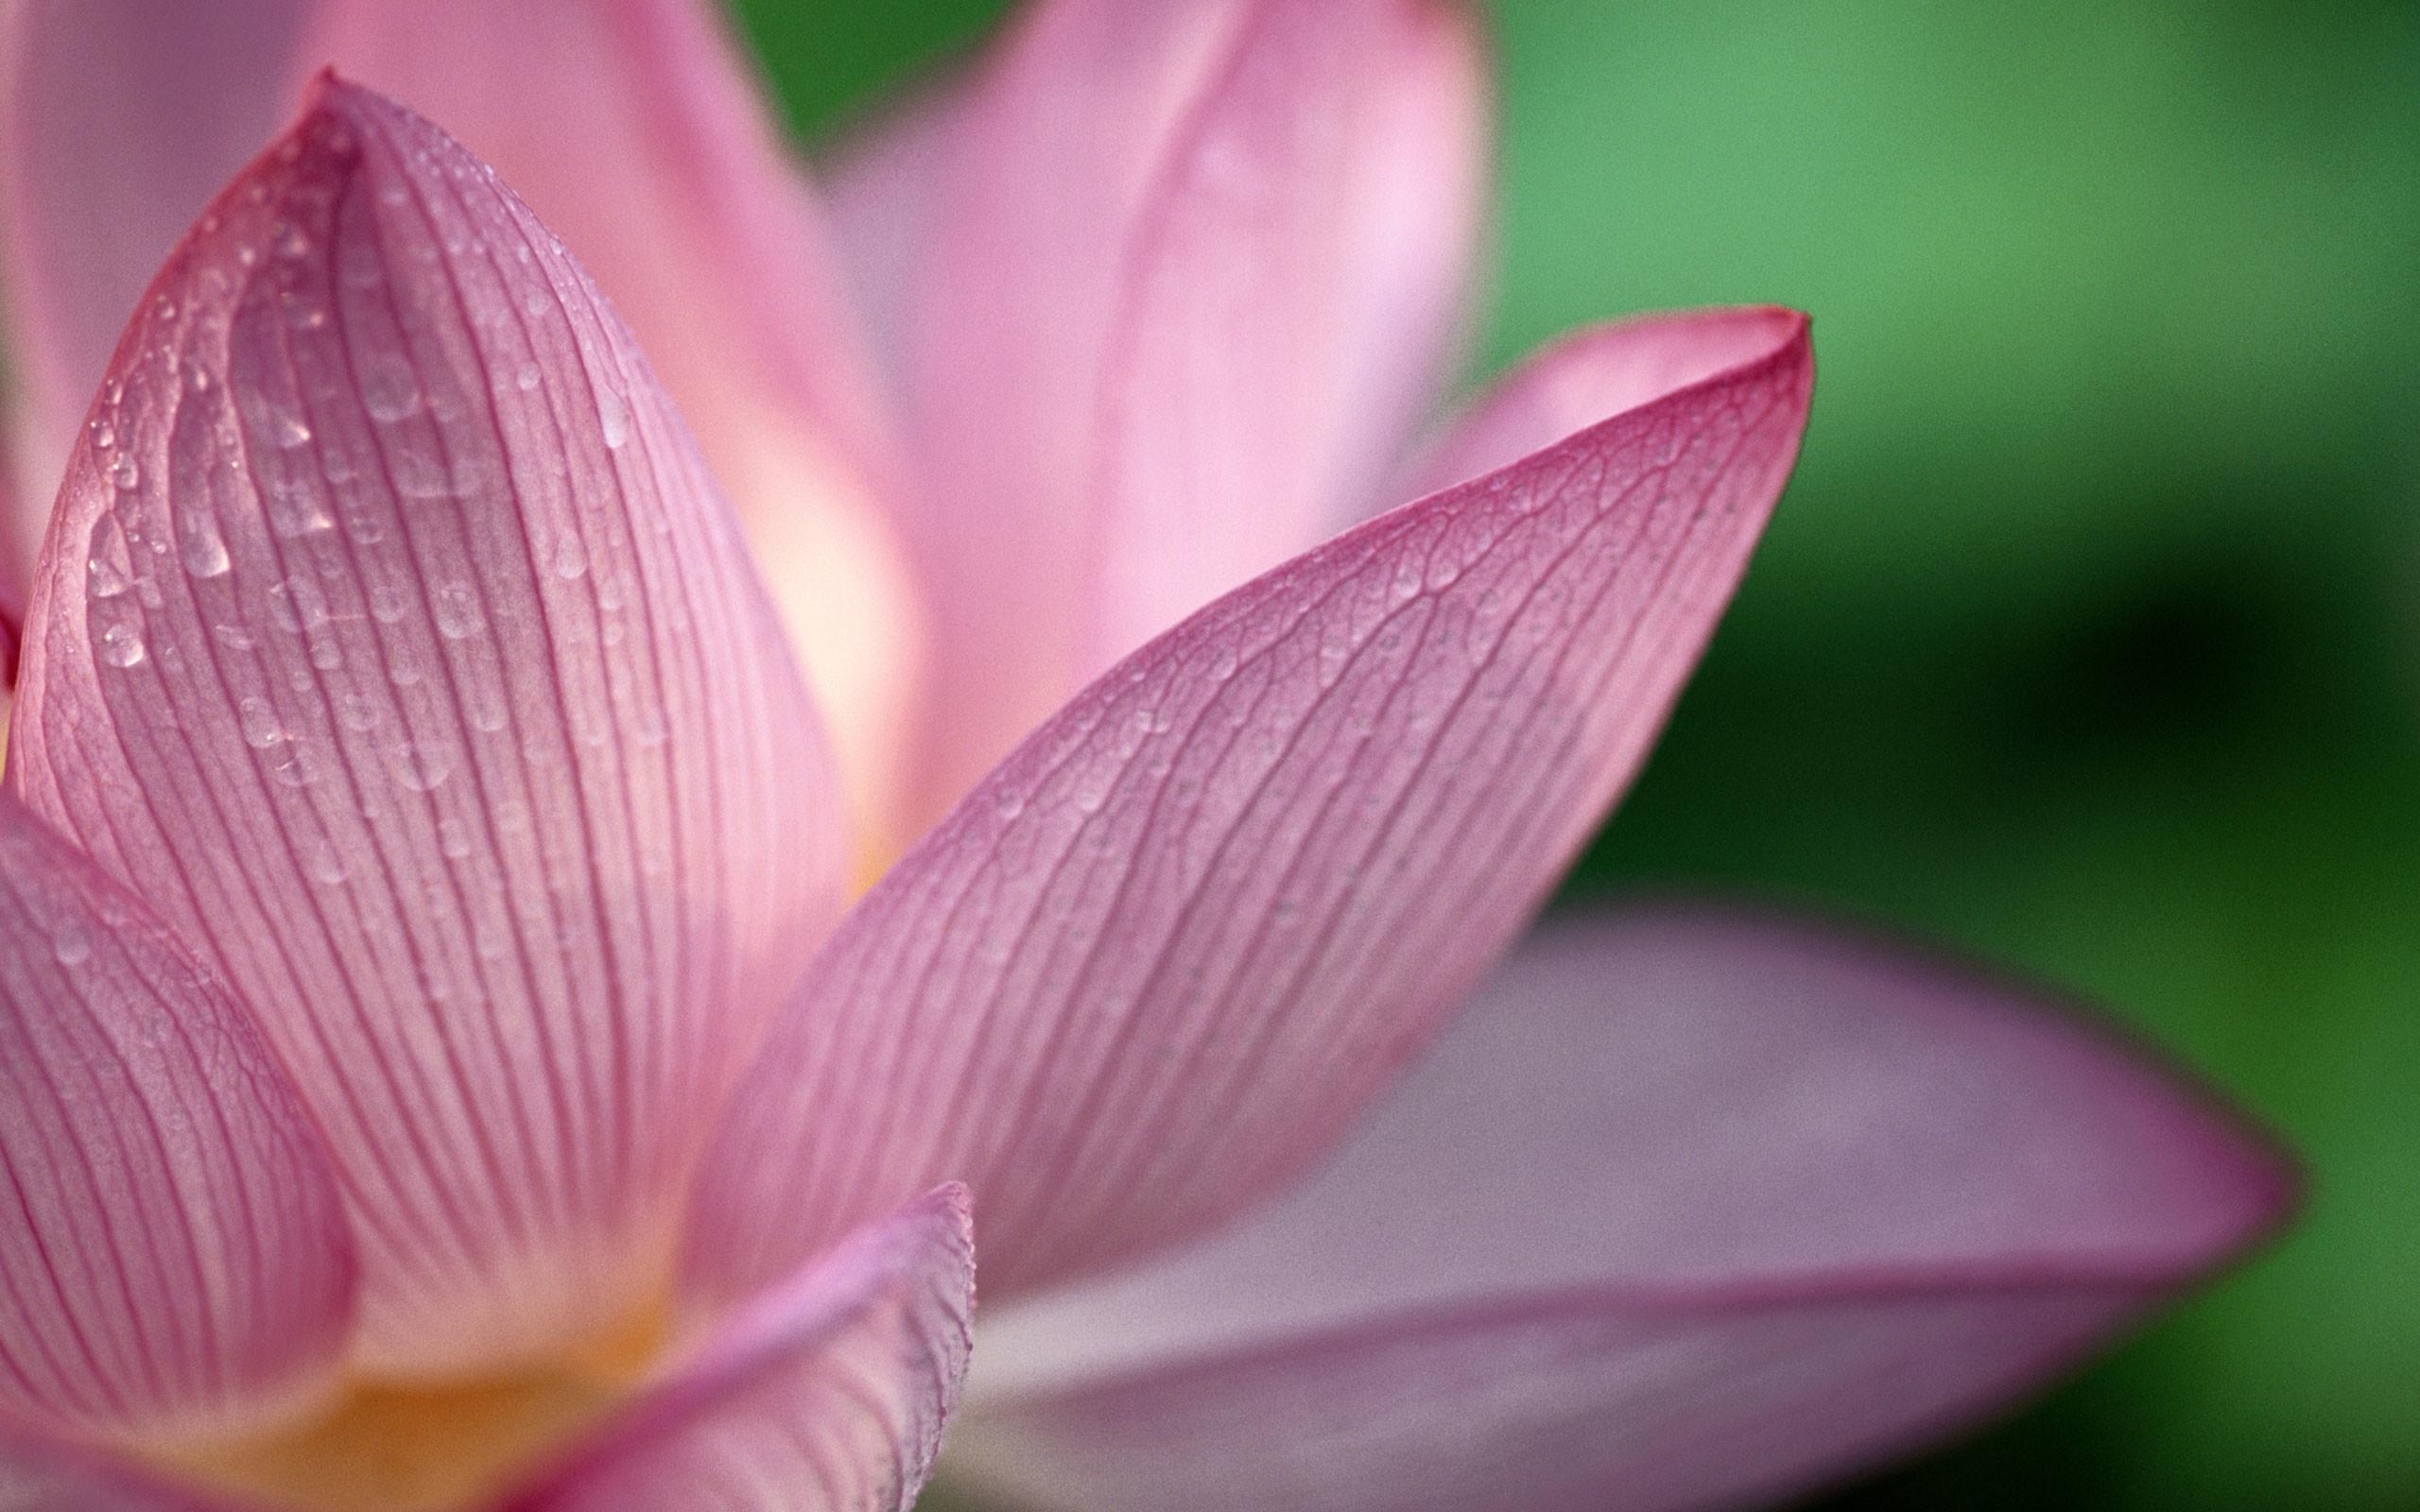 lotus flower background wallpaper 65 images